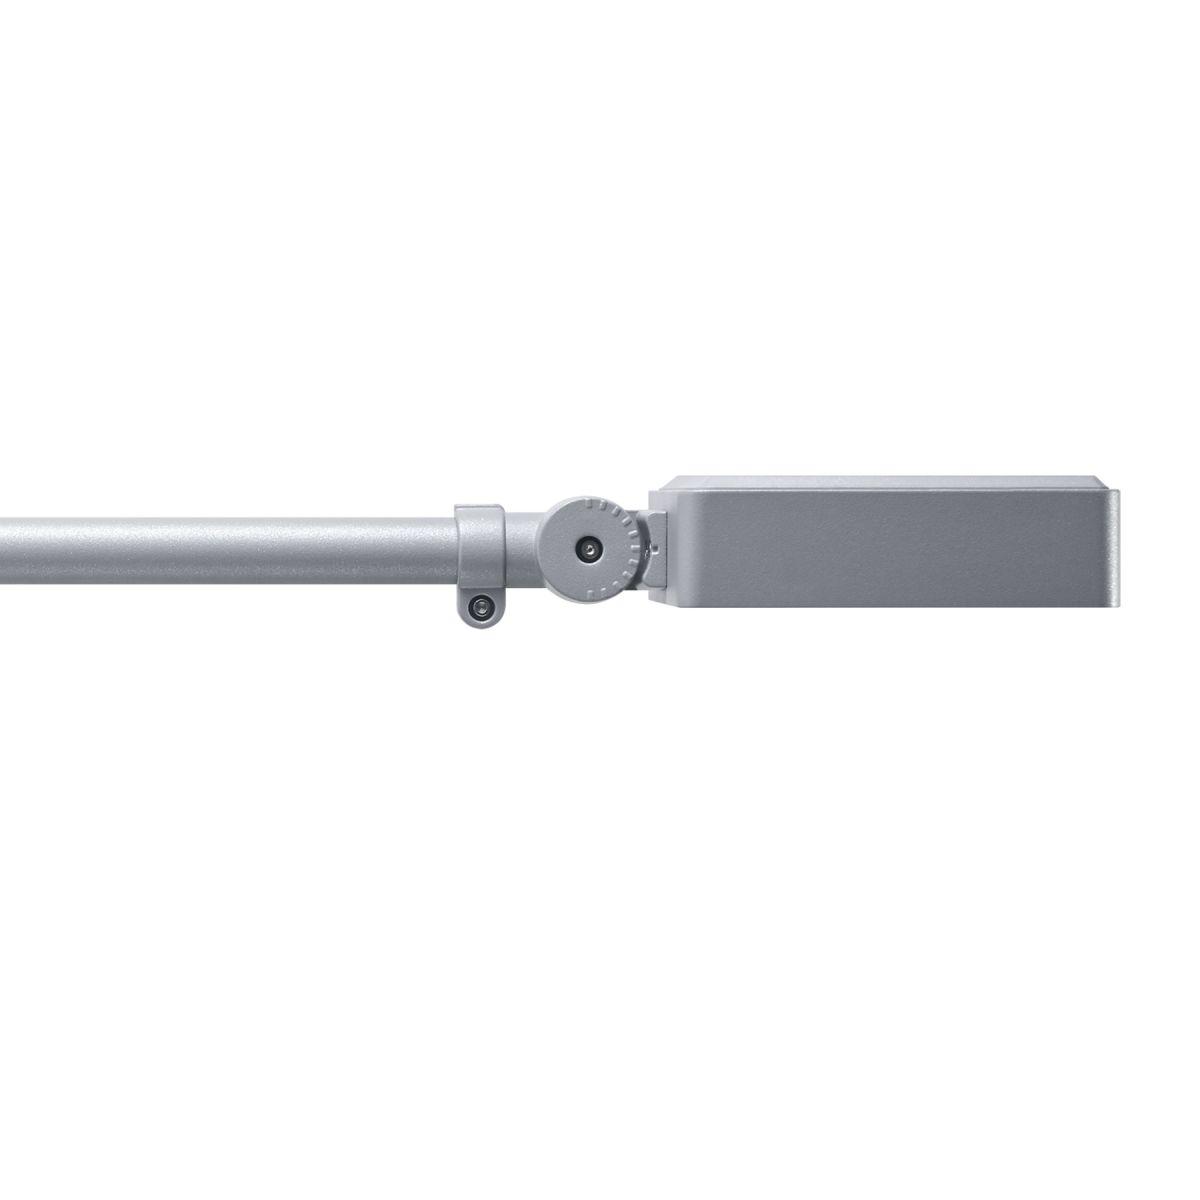 Medium ALPHA Square - Gear Arm